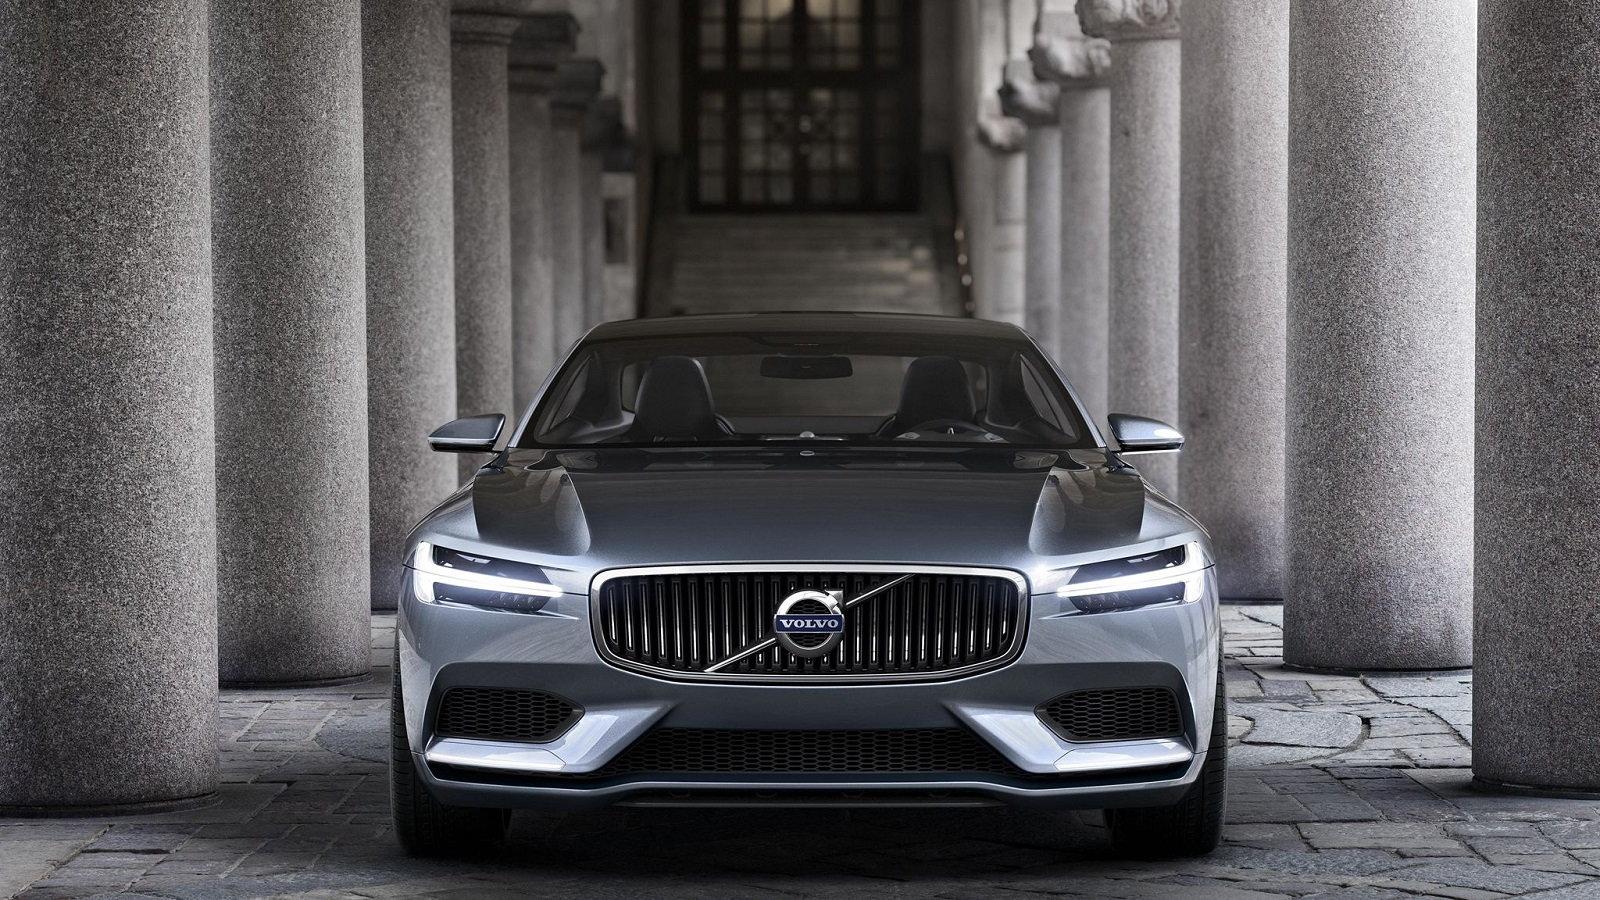 2017 Volvo C90: Rumors, Release Date